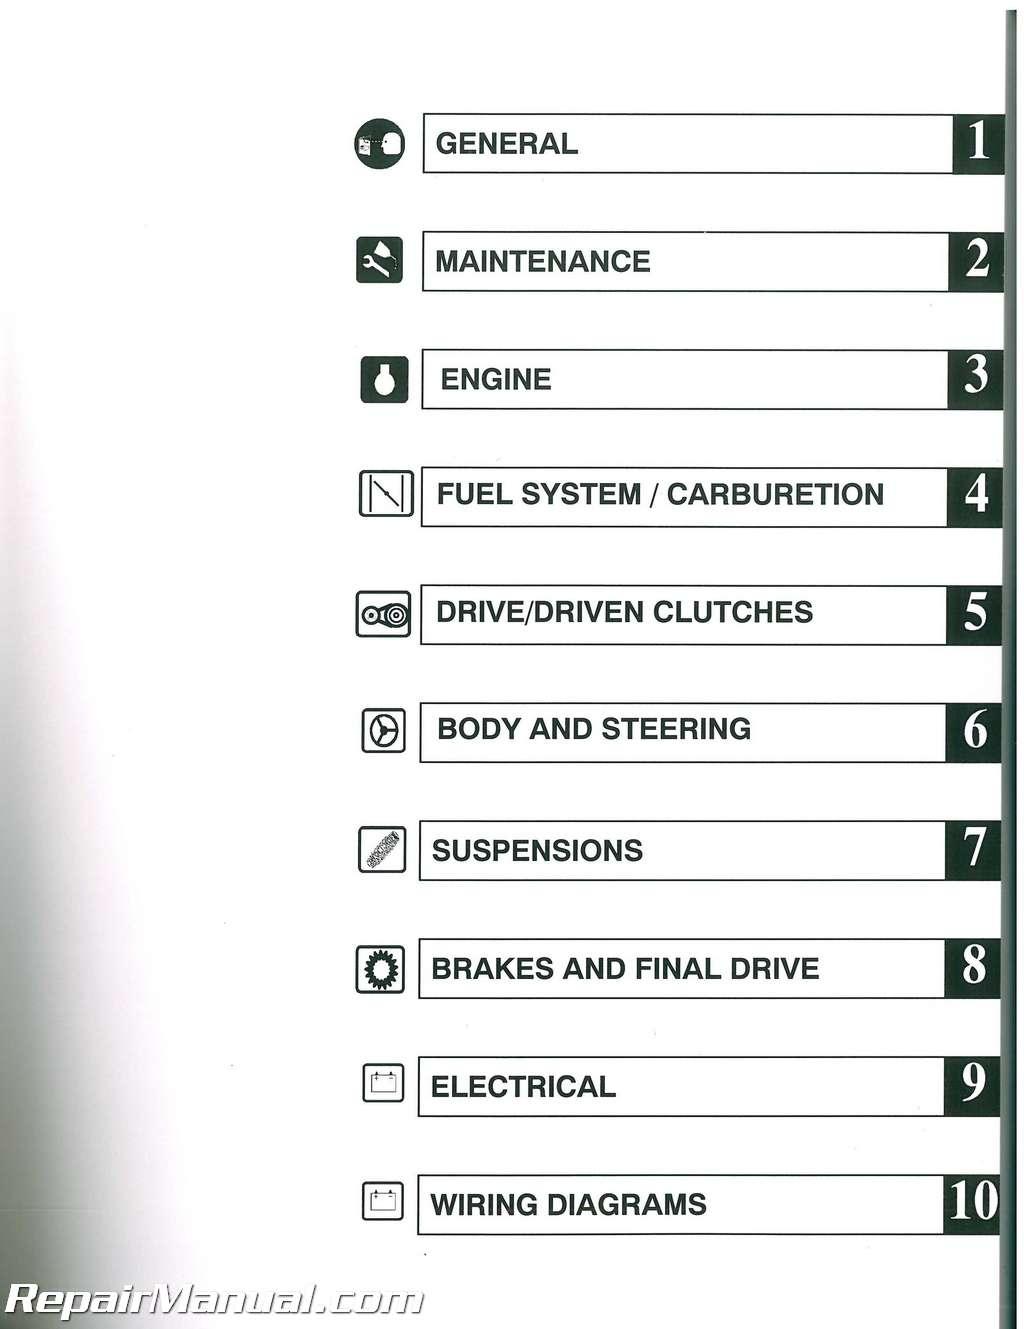 2002 Polaris 500 550 600 700 Classic Trail Luxury Snowmobile Service Manual